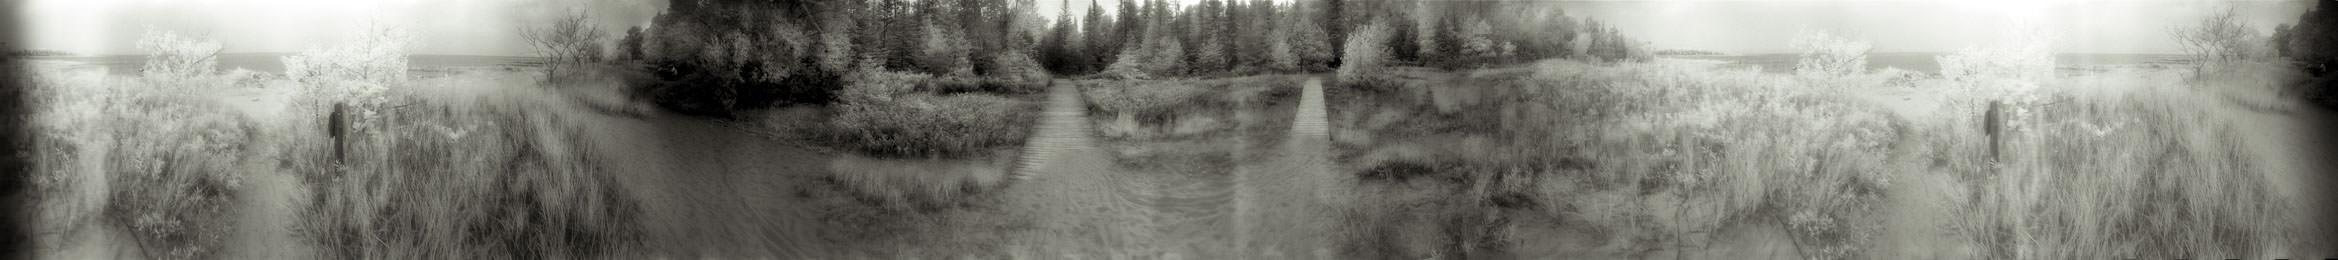 """Dune Boardwalk"" from the series Footprints, by William Mokrynski"